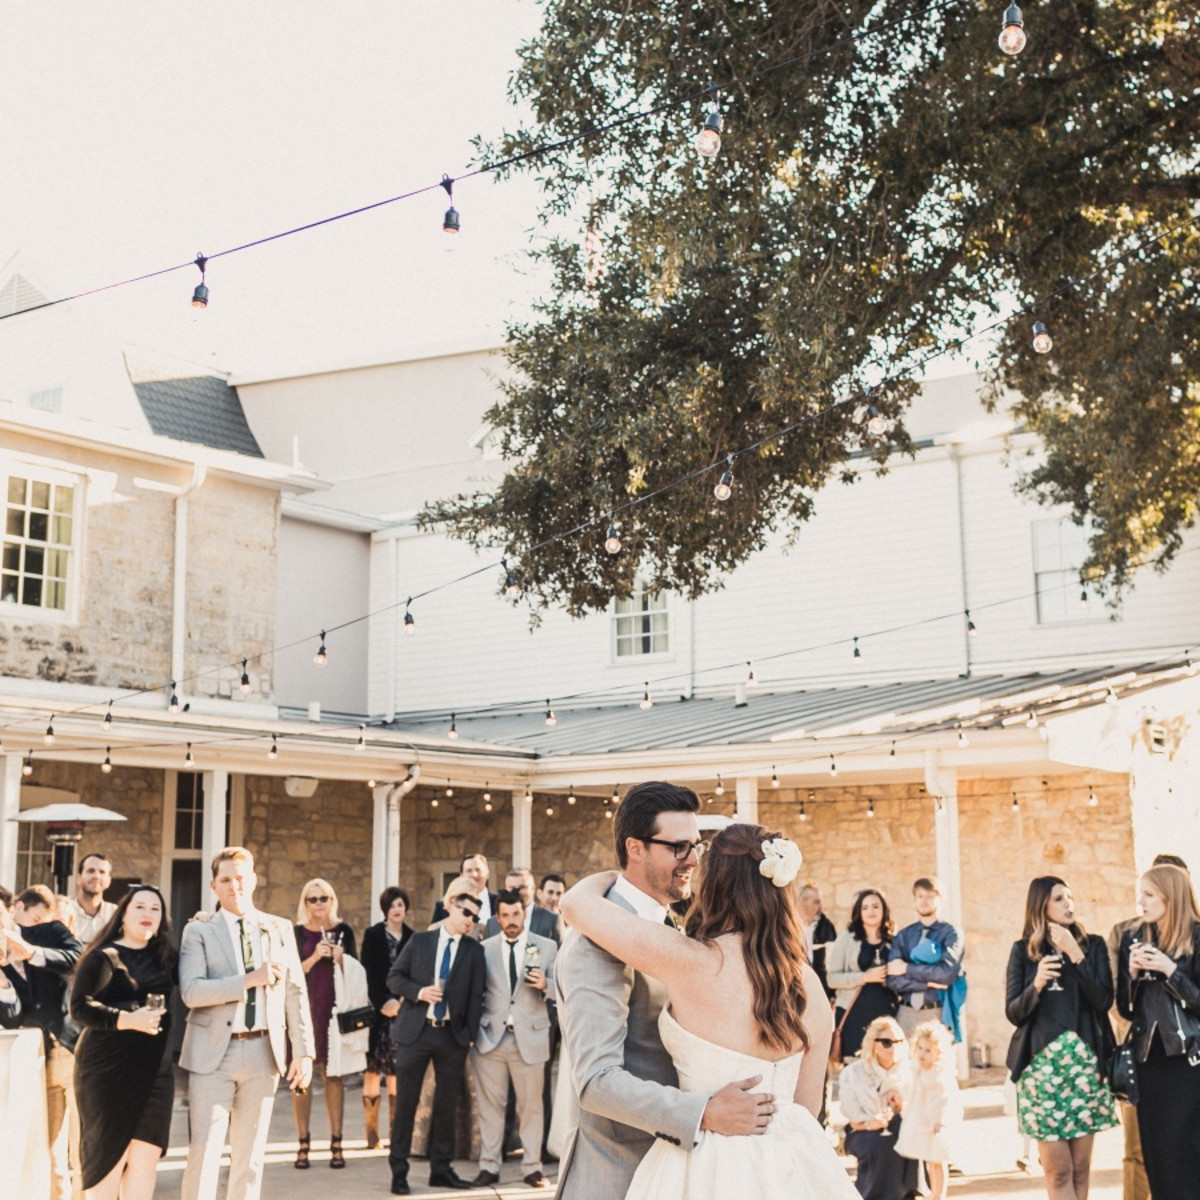 e515fb0dfb6 Austin couple s Hill Country wedding ends long-distance love affair ...